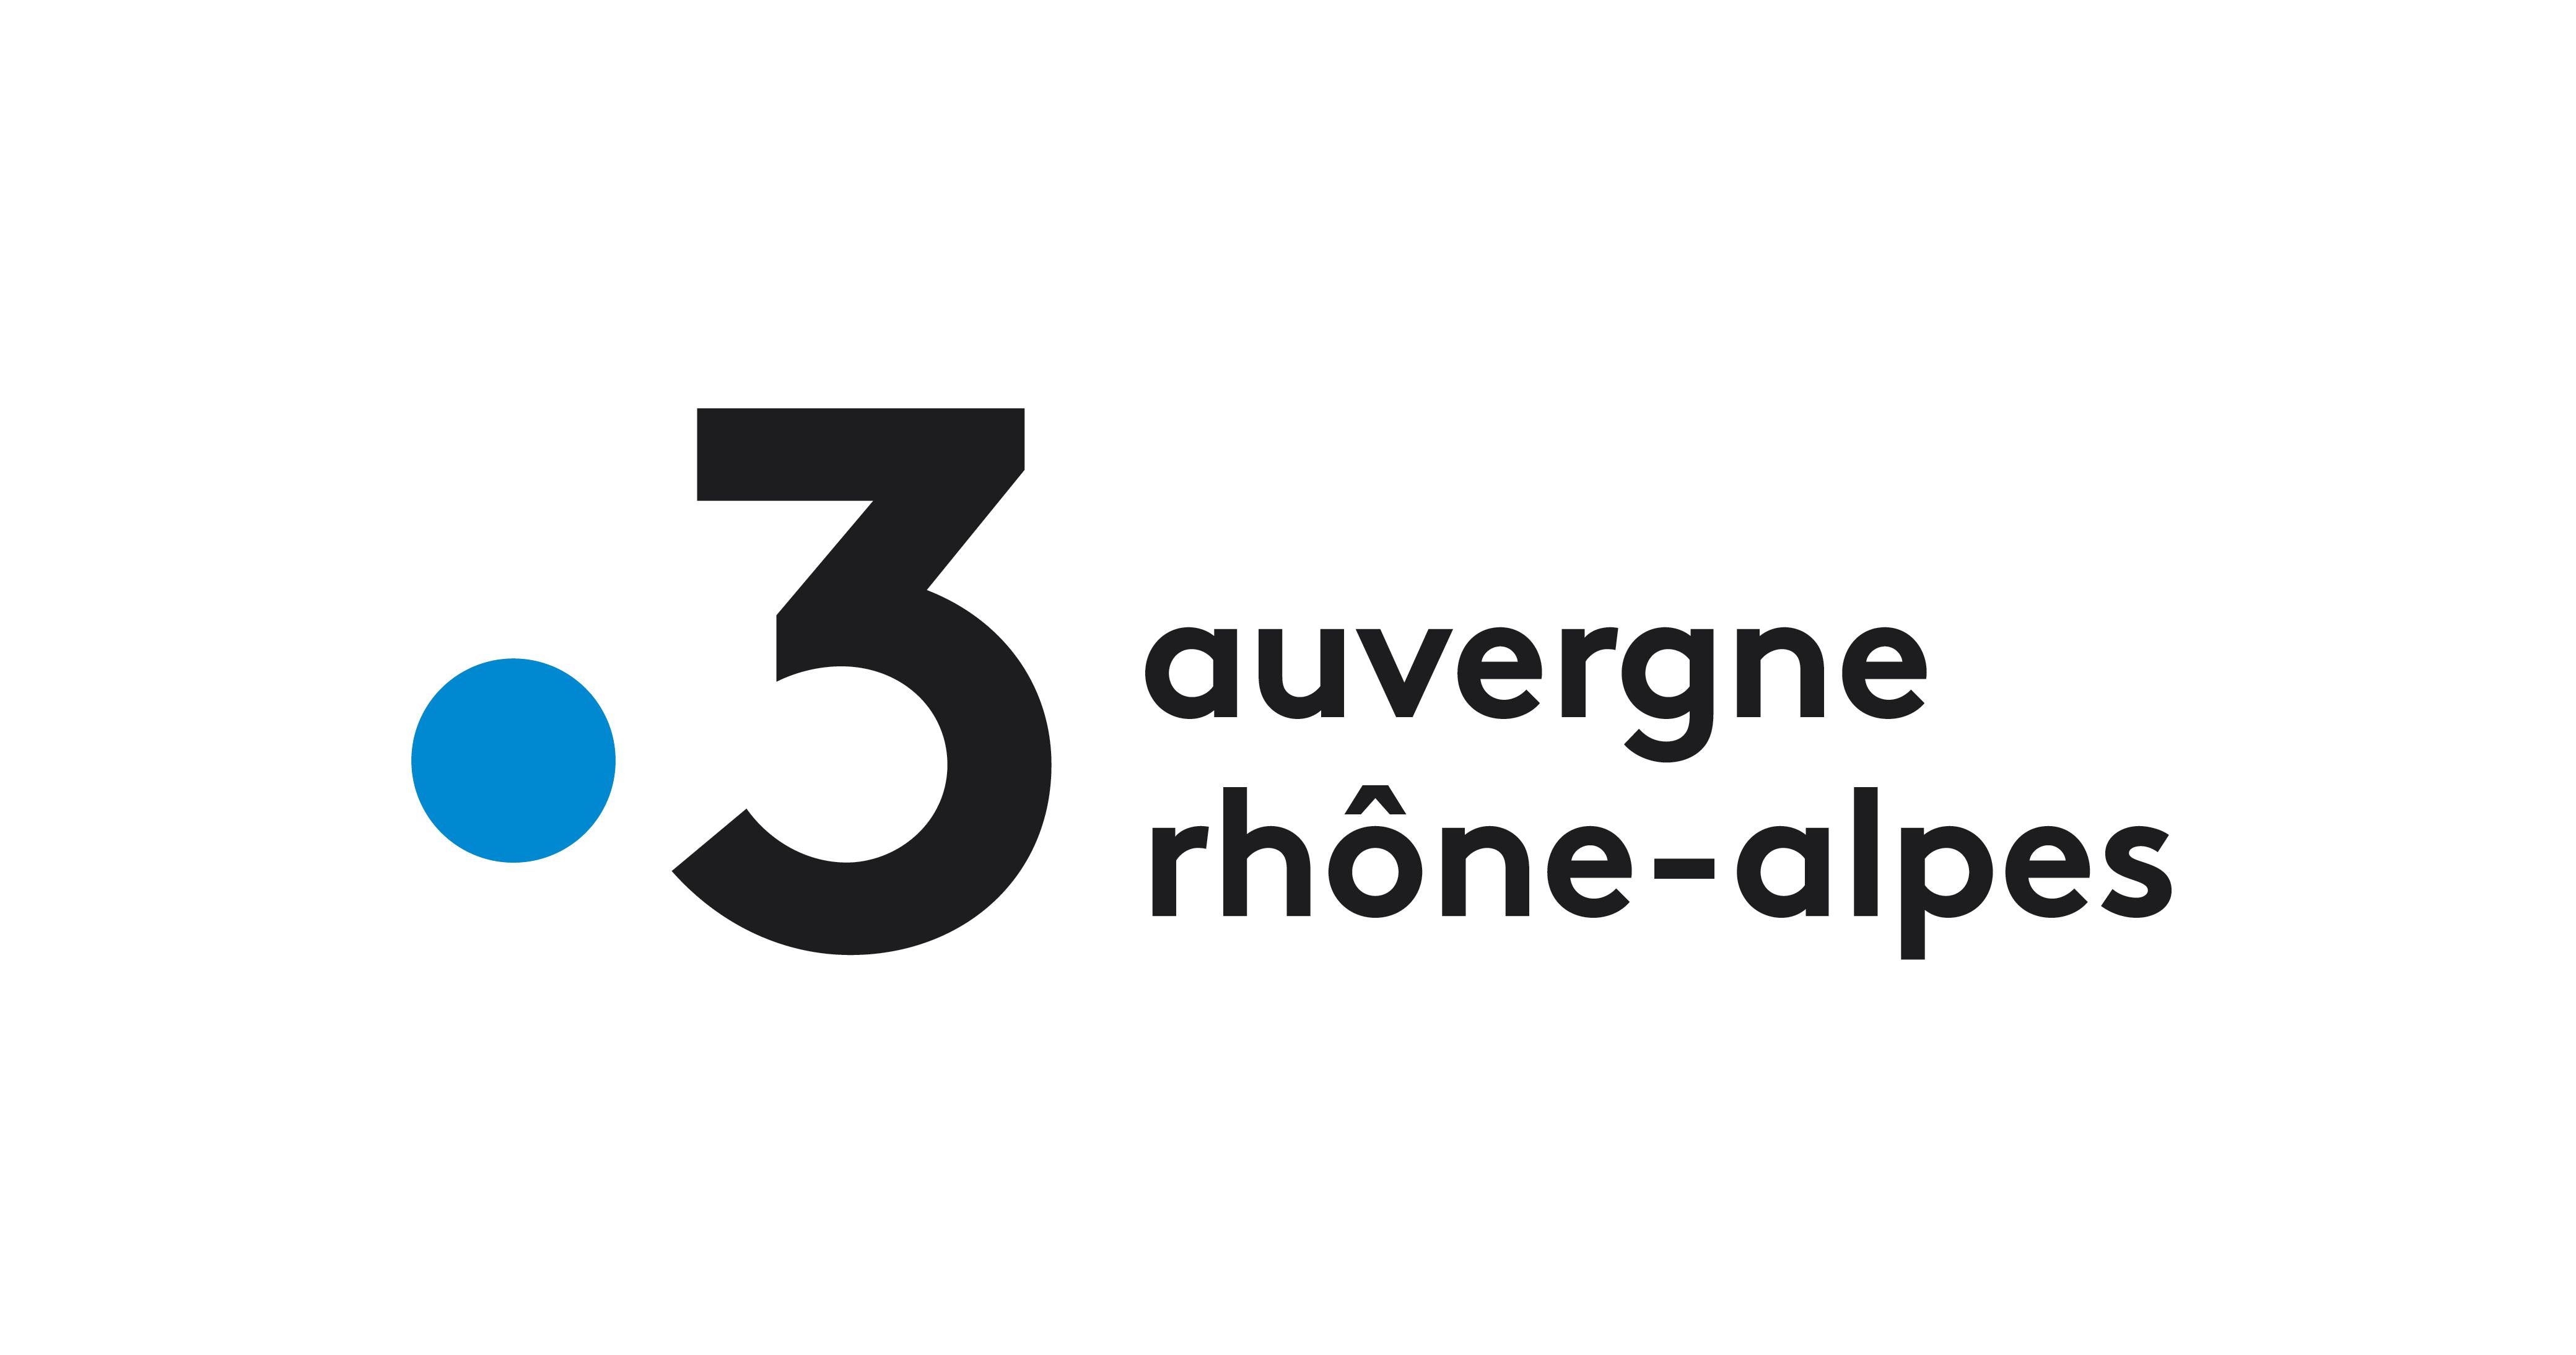 france_3_auvergne_rhone_alpes